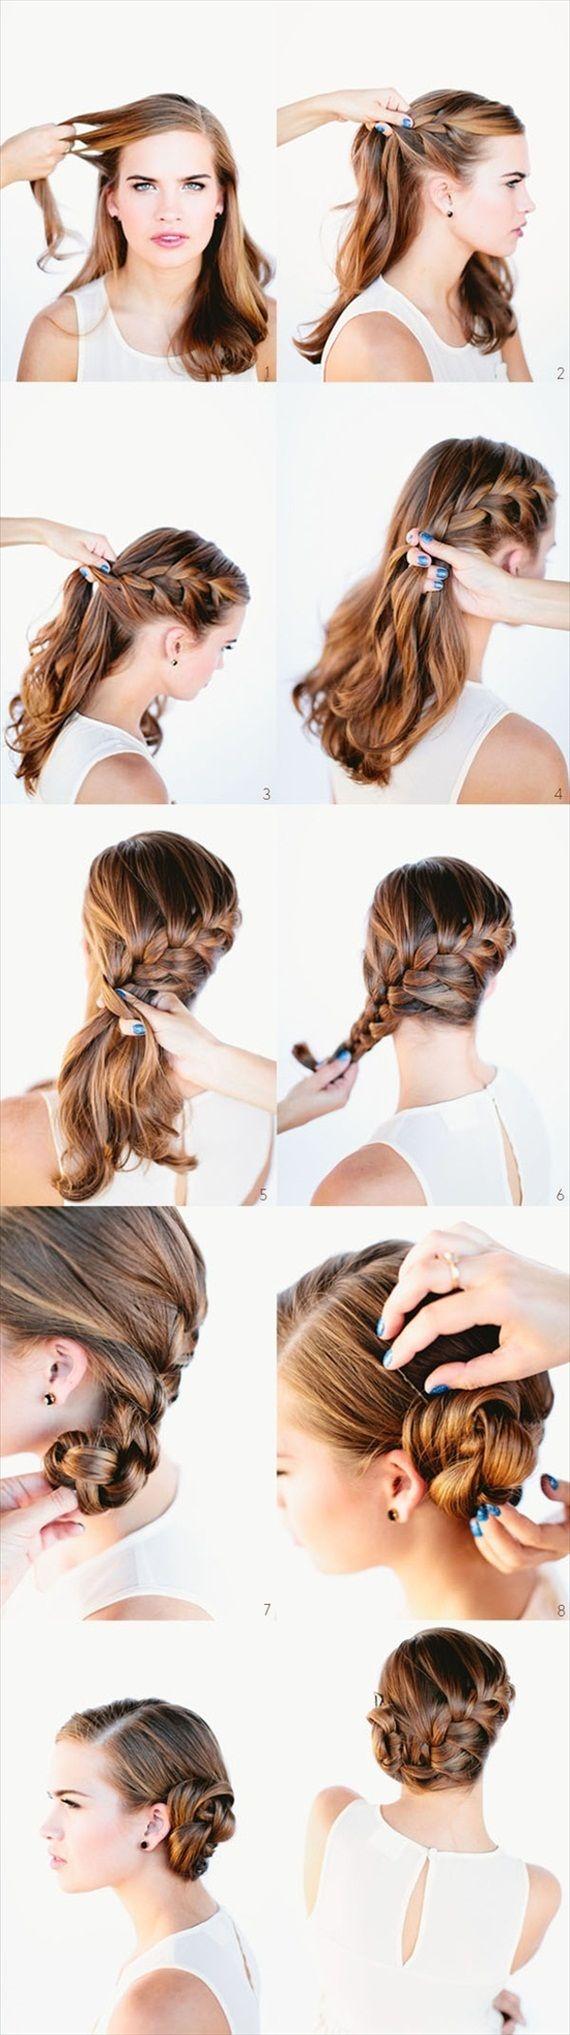 diy-braided-bun-chignon.jpg 570×2,035 pixels